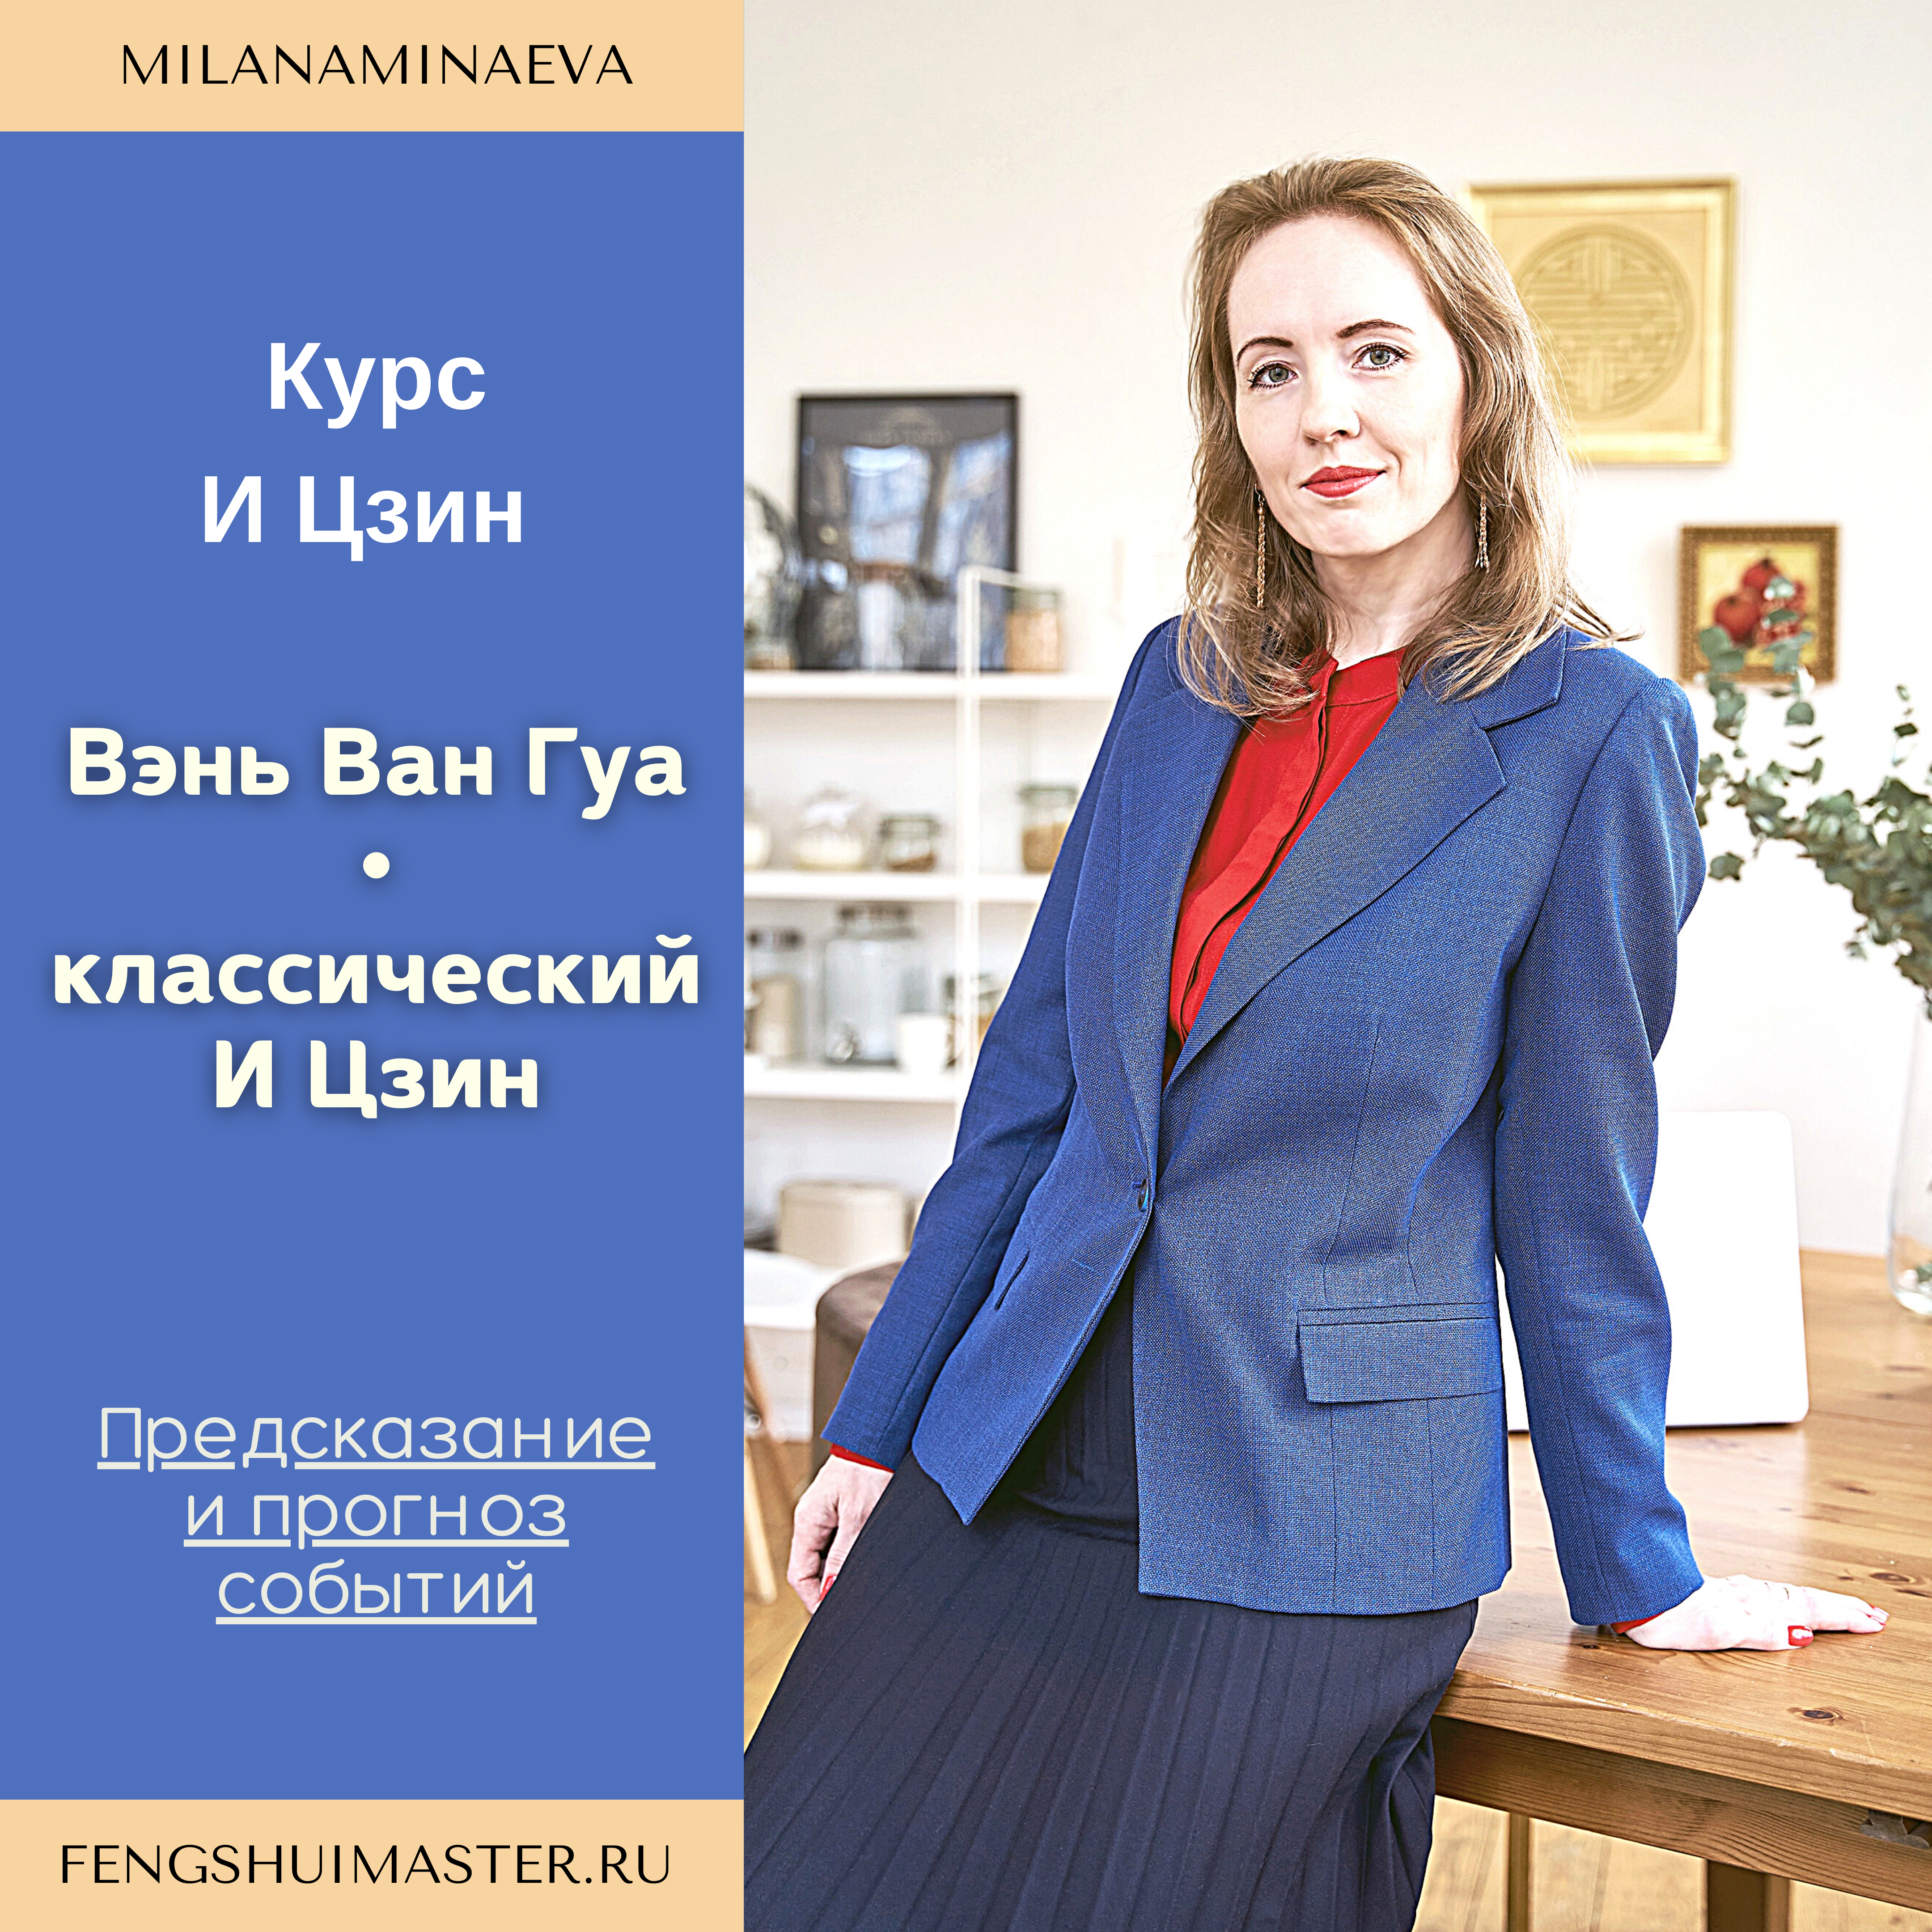 Курс И Цзин классический - Milana.Ru